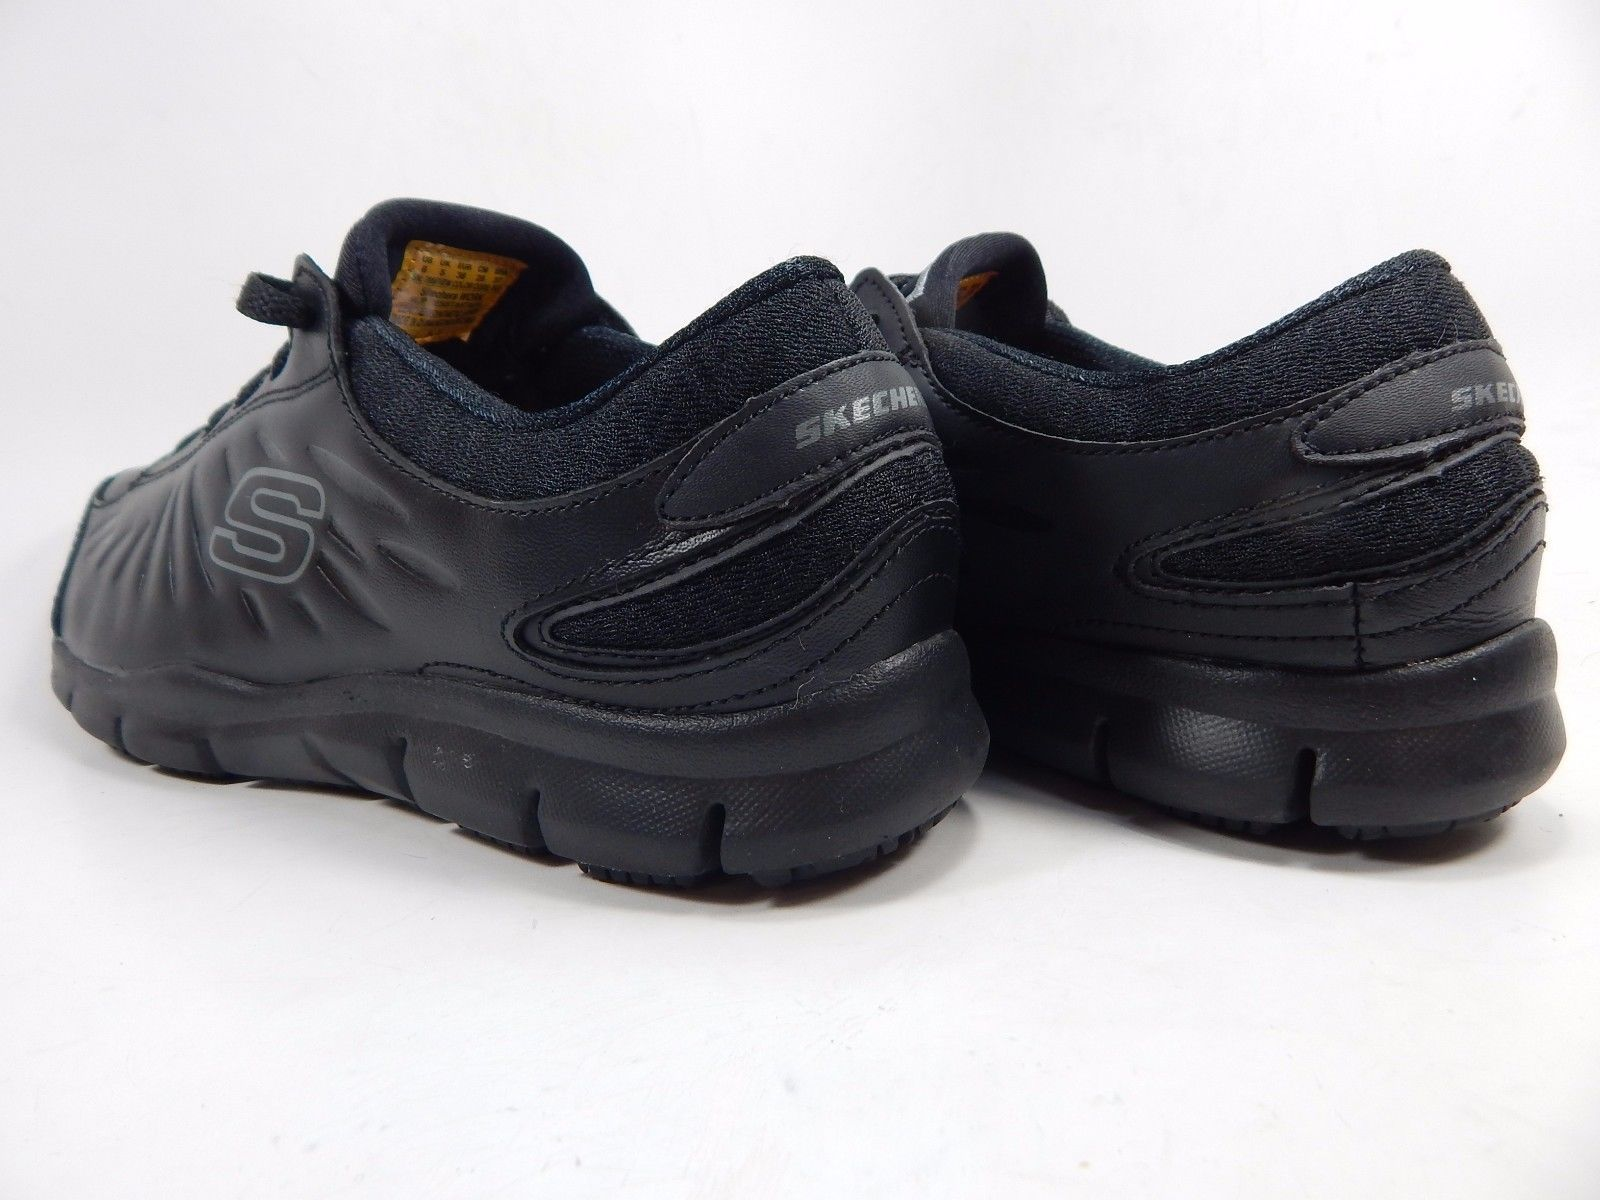 Skechers Eldred SR Relaxed Fit Women's Work Shoes Size: US 8 D WIDE EU 38 Black